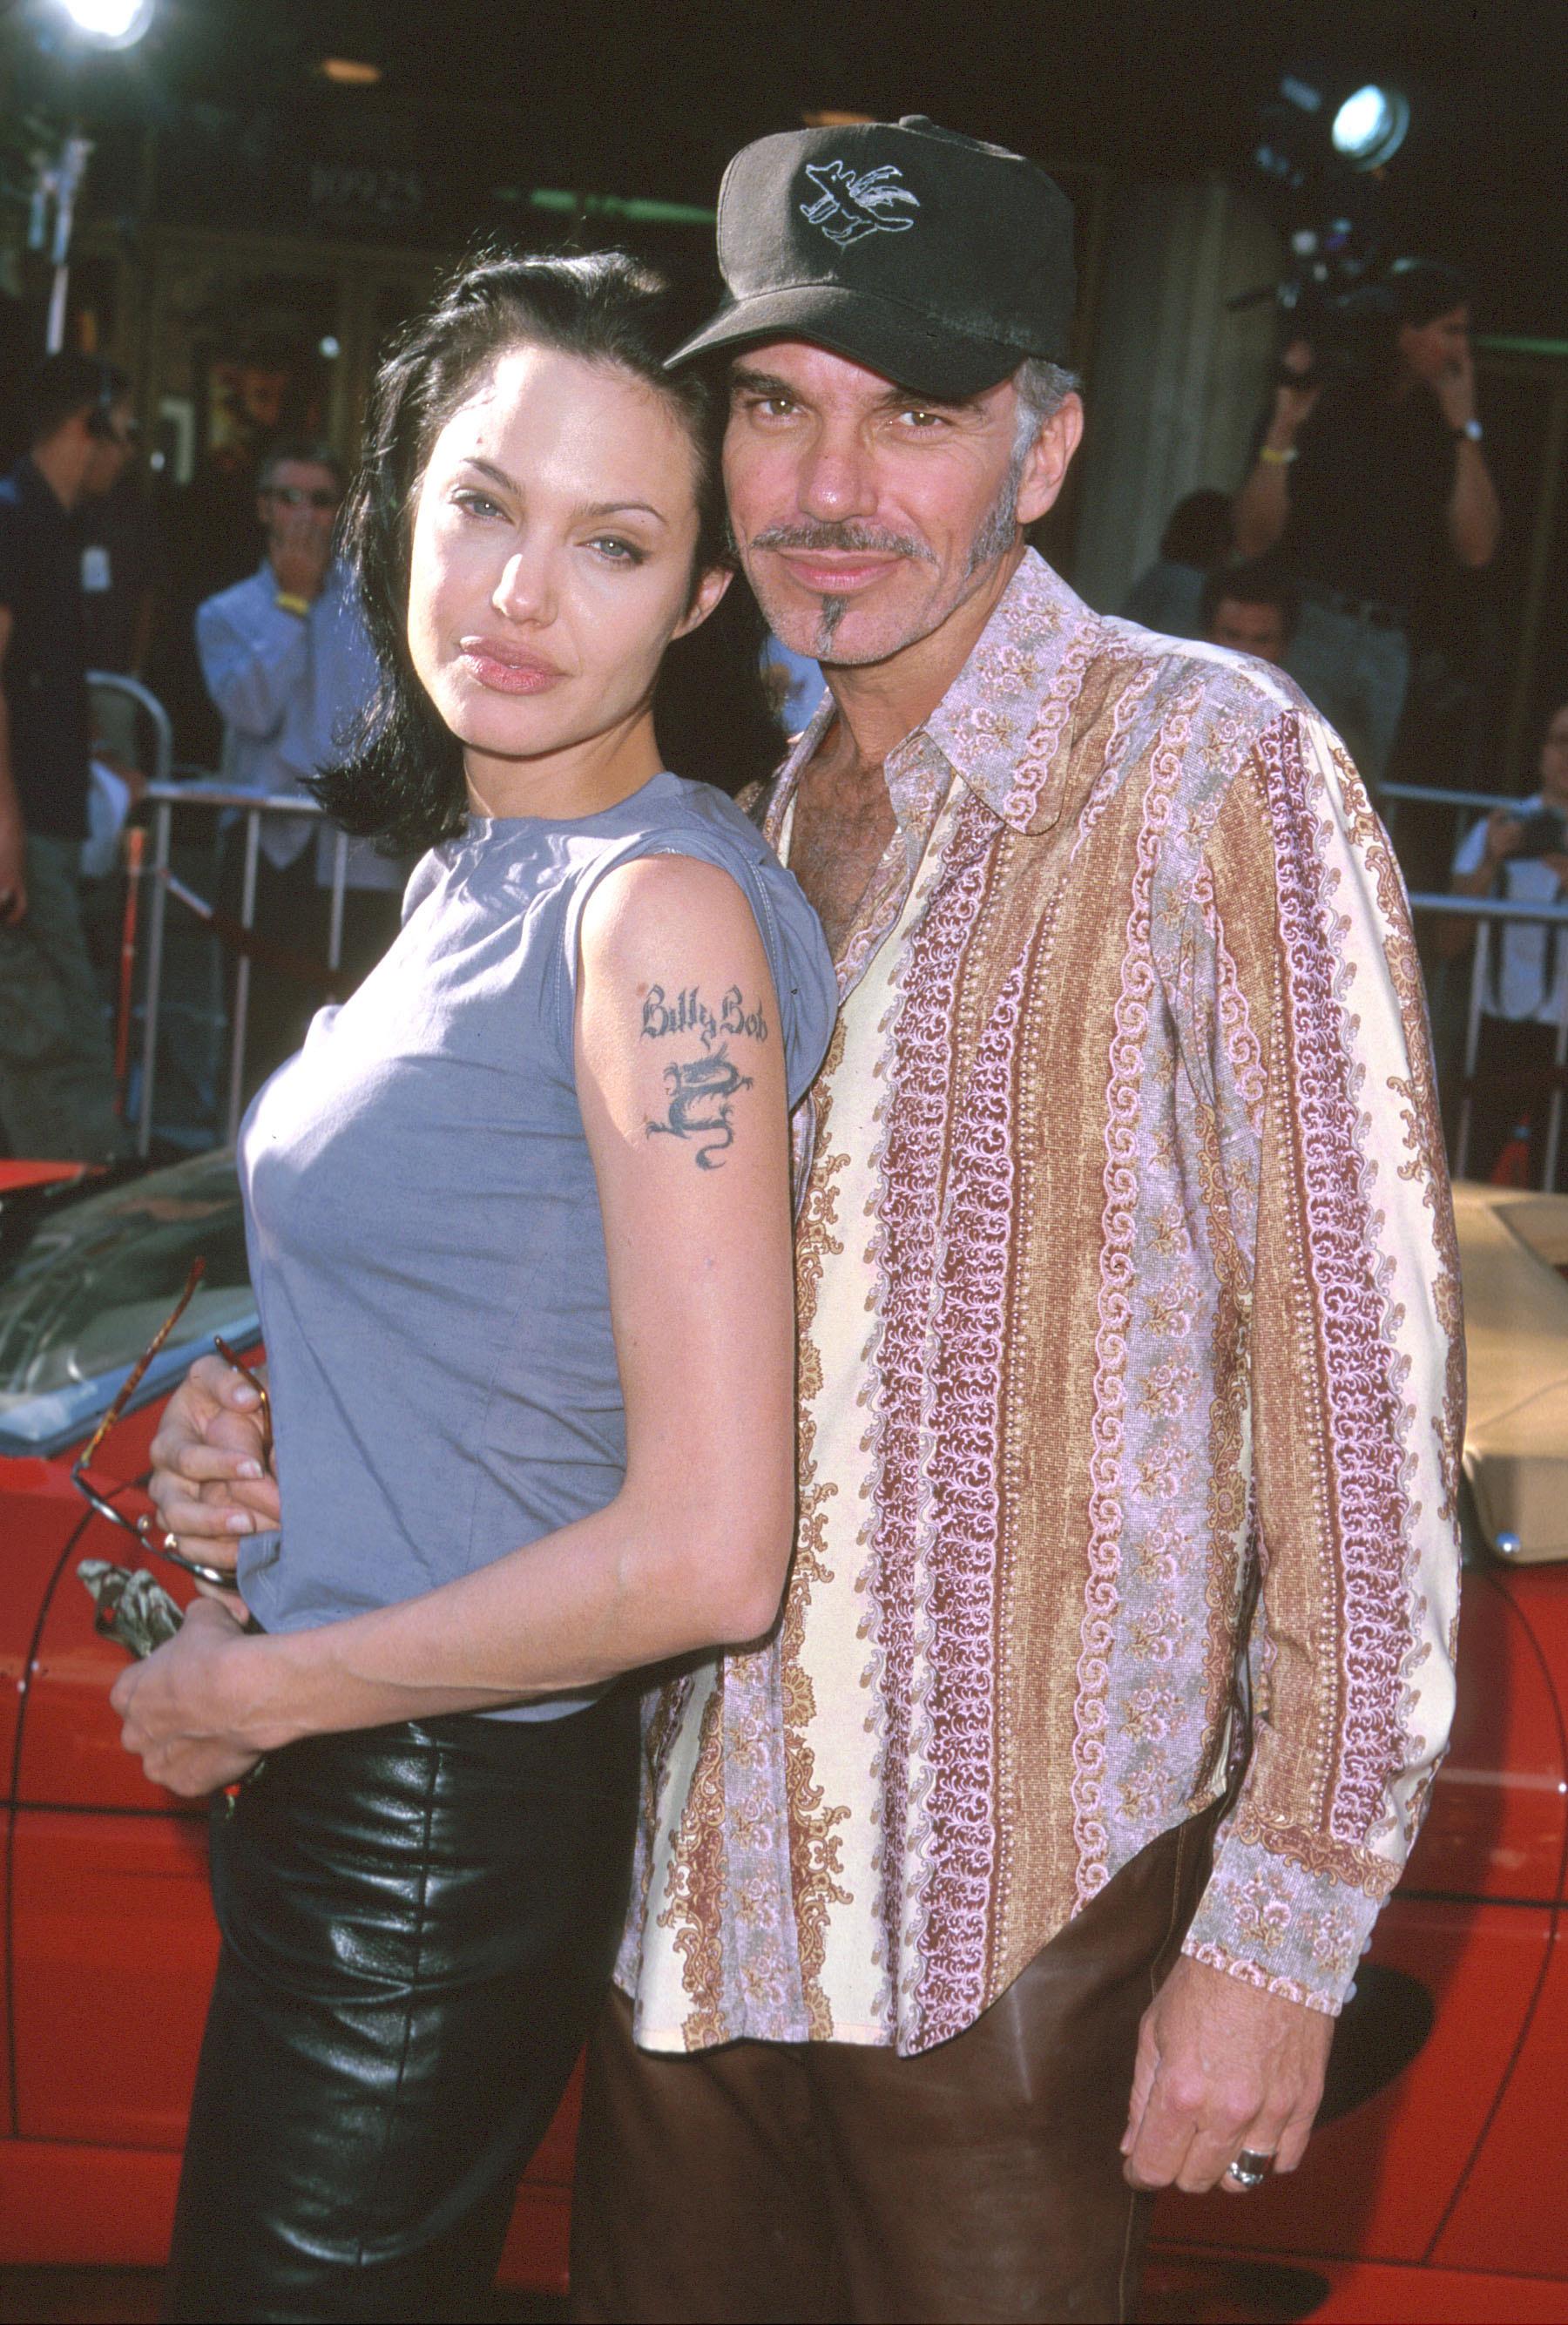 Billy Bob Thornton explains those Angelina Jolie blood vials